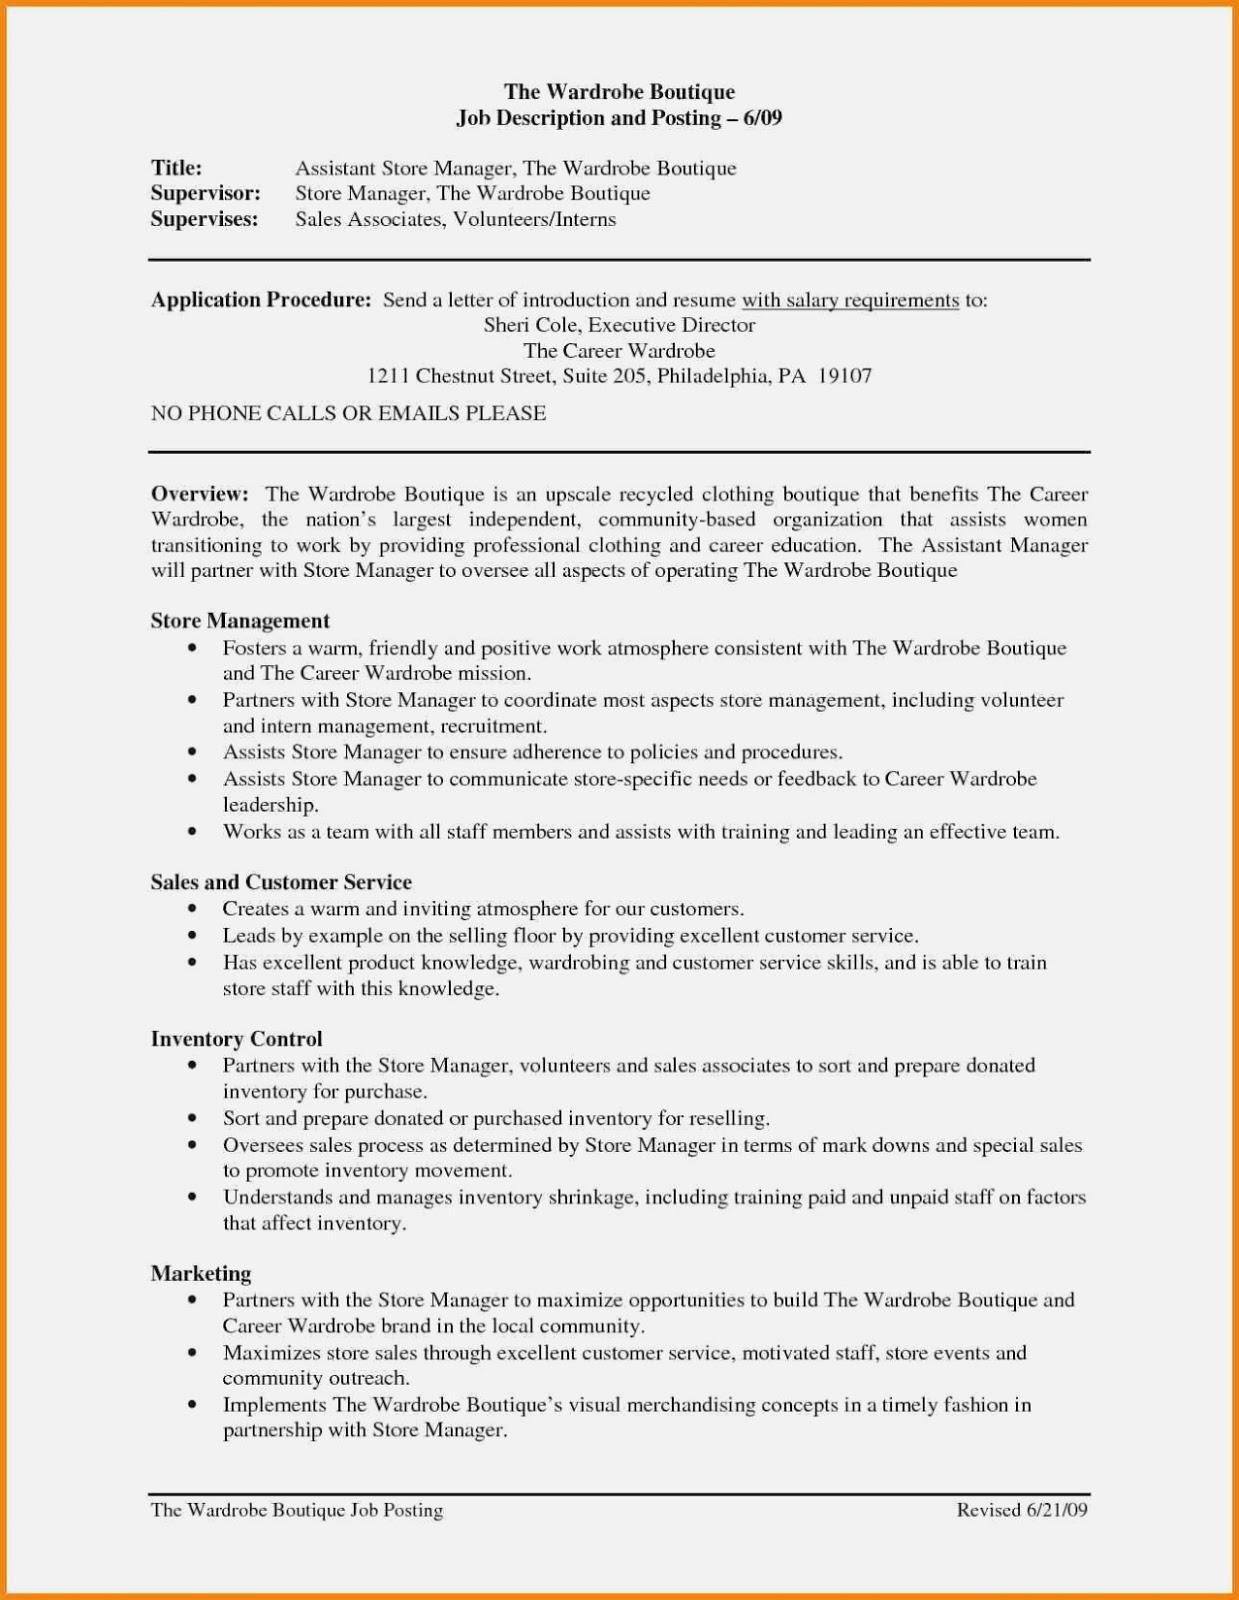 land surveyor resume sample 2019 land surveyor resume examples 2020 land surveyor resume cover letter land surveyor resume format download land surveyor resume format land surveyor resume objective land surveyor resume template